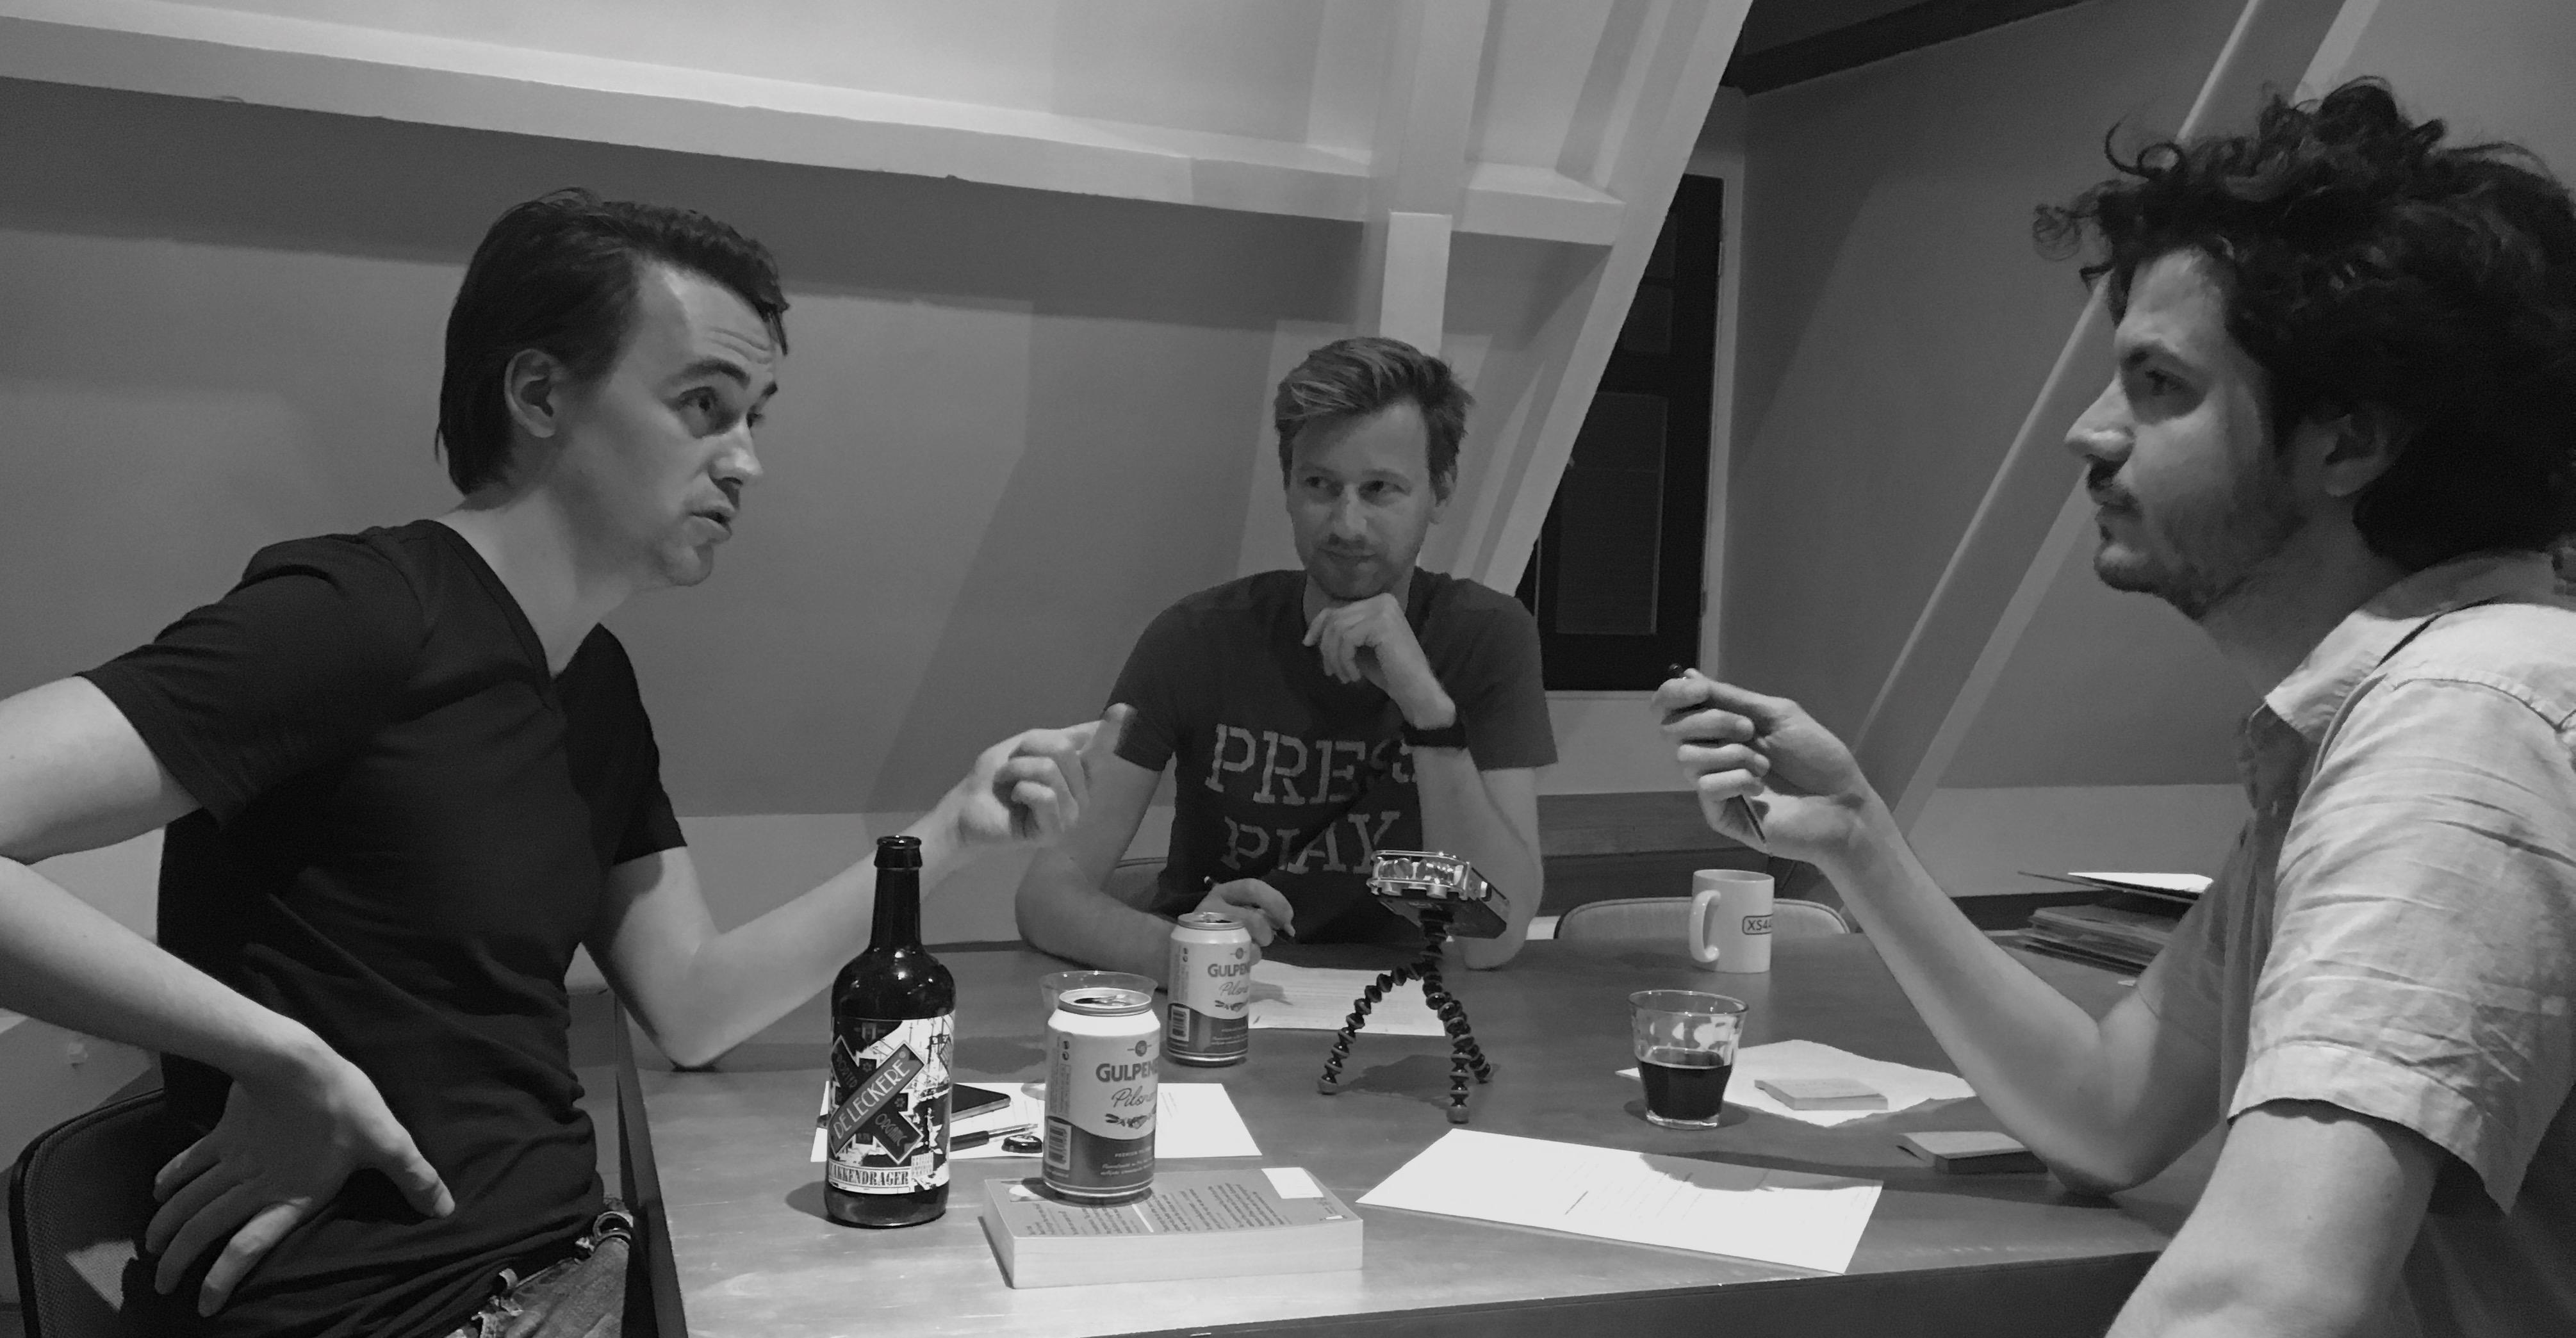 Alexander, onze producer Botte Jellema en ik, afgelopen dinsdagavond